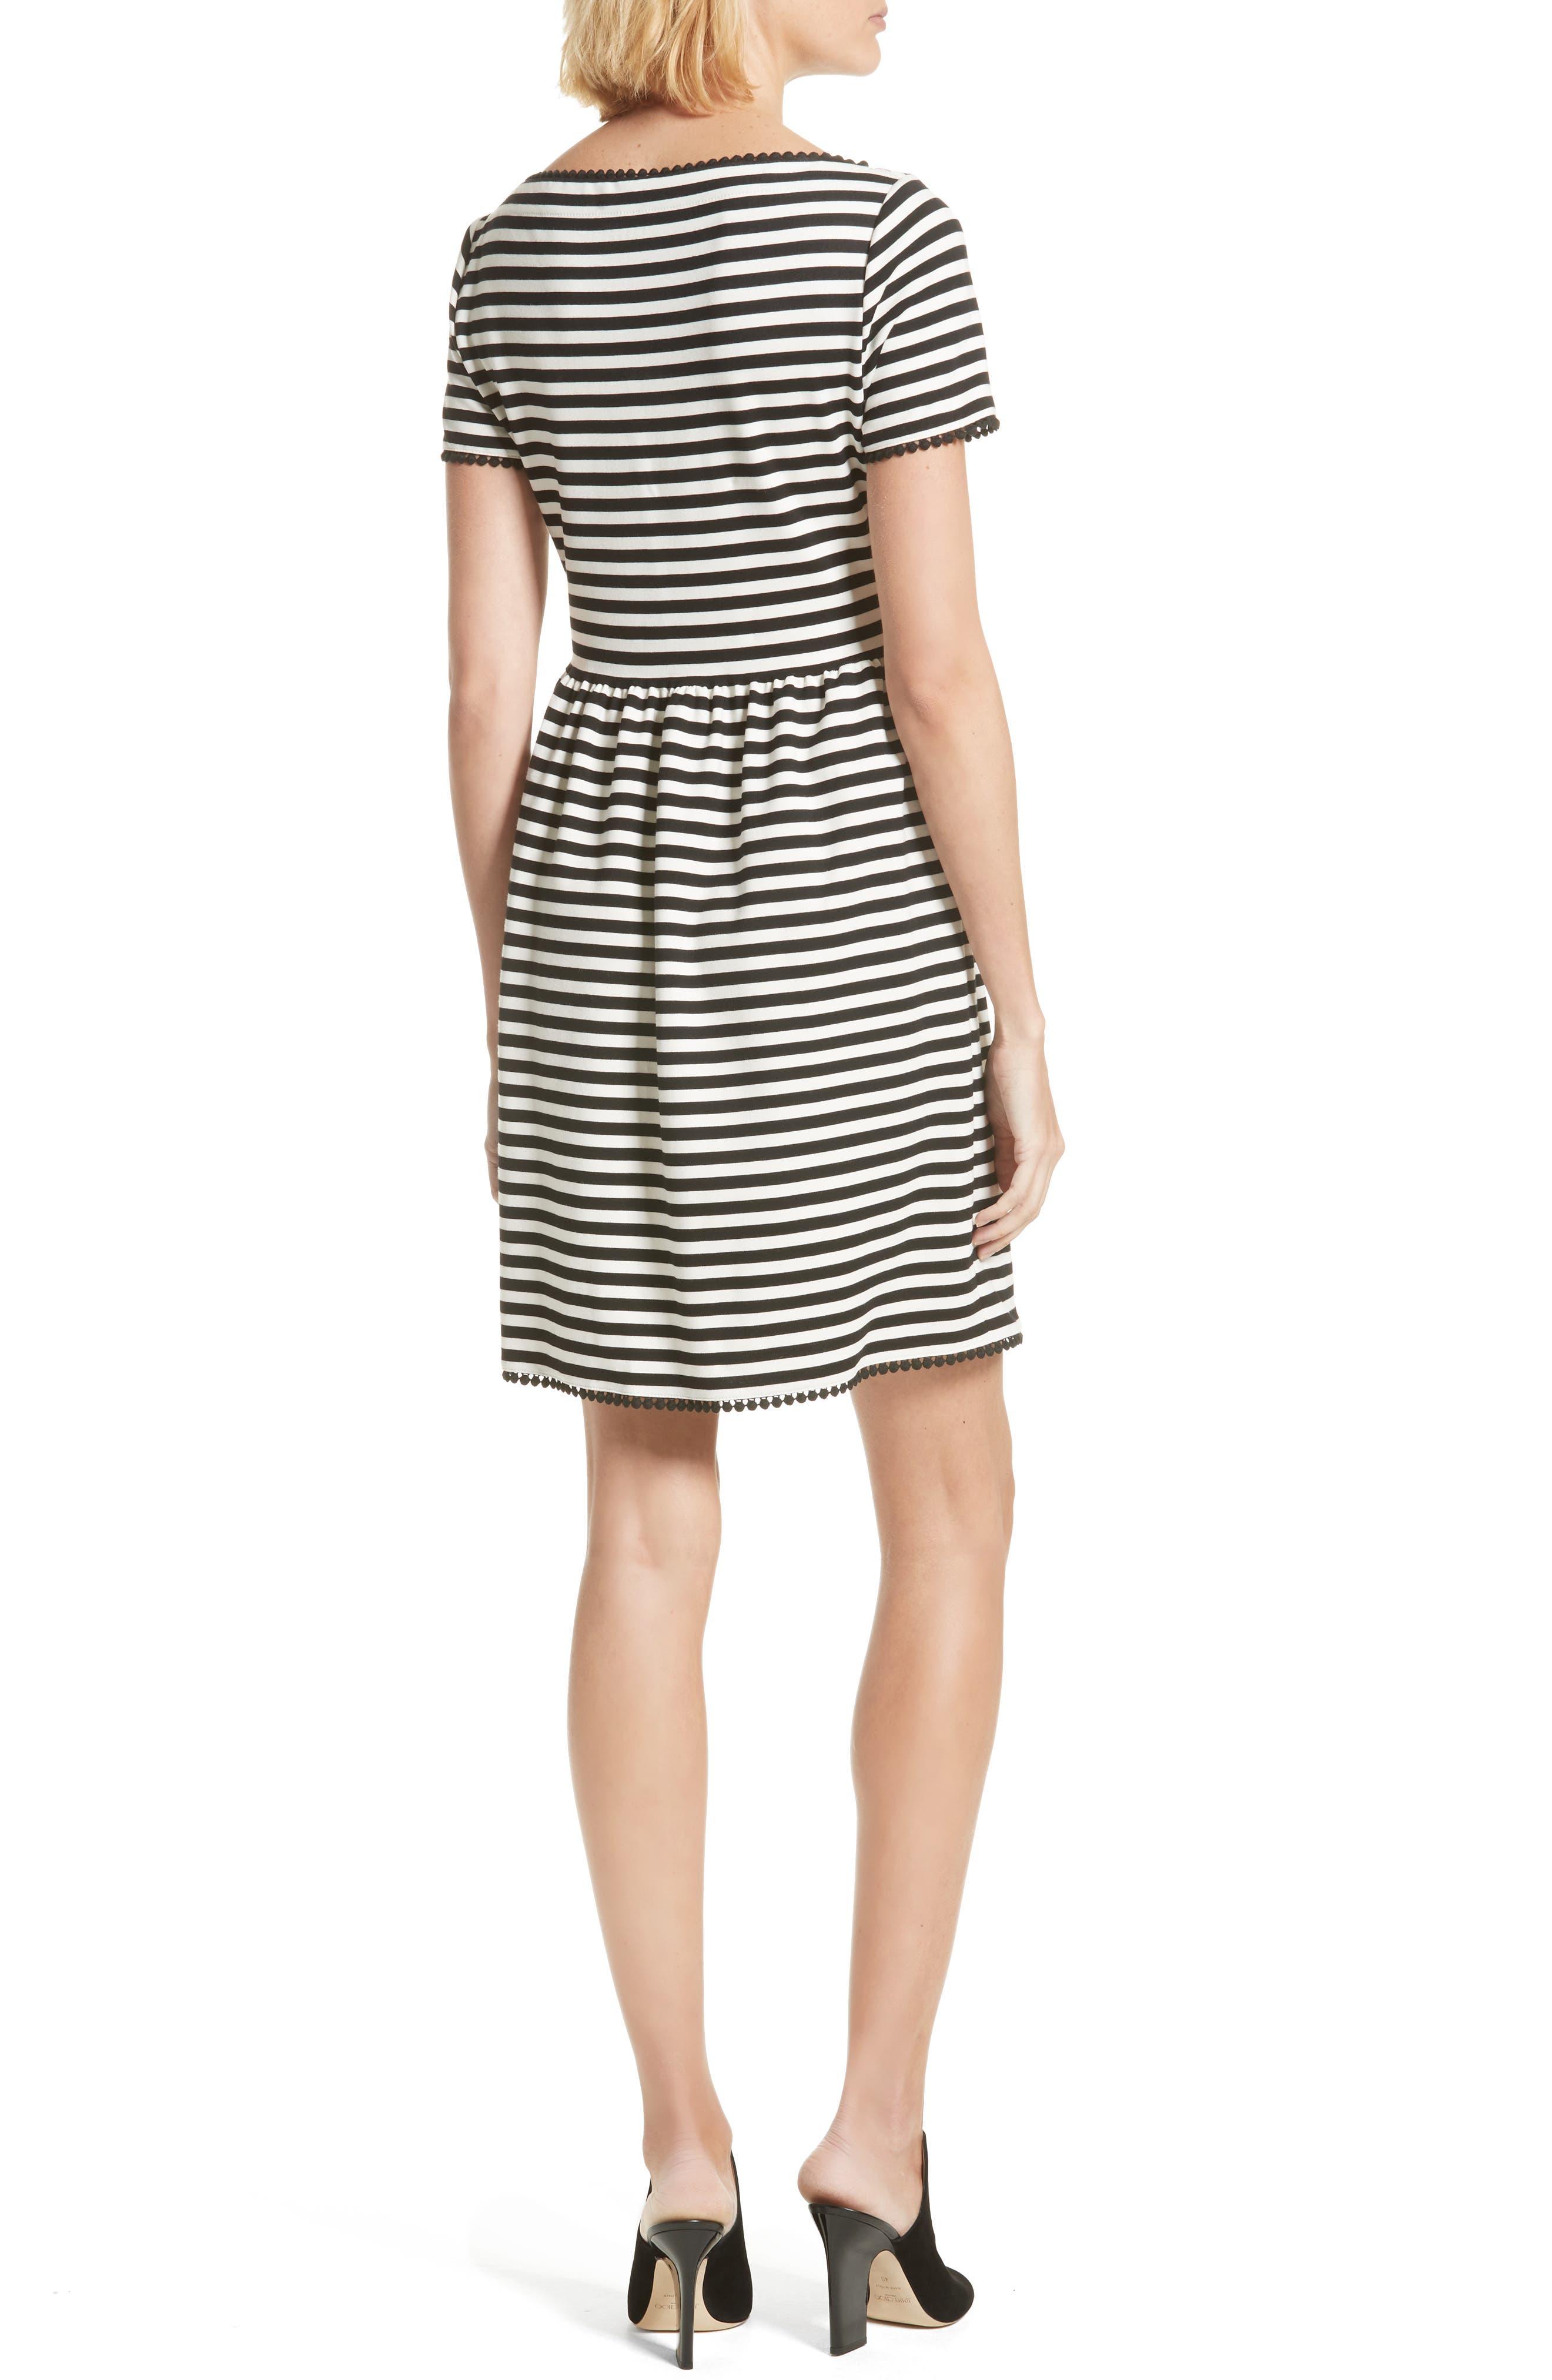 KATE SPADE NEW YORK,                             stripe ponte dress,                             Alternate thumbnail 2, color,                             900